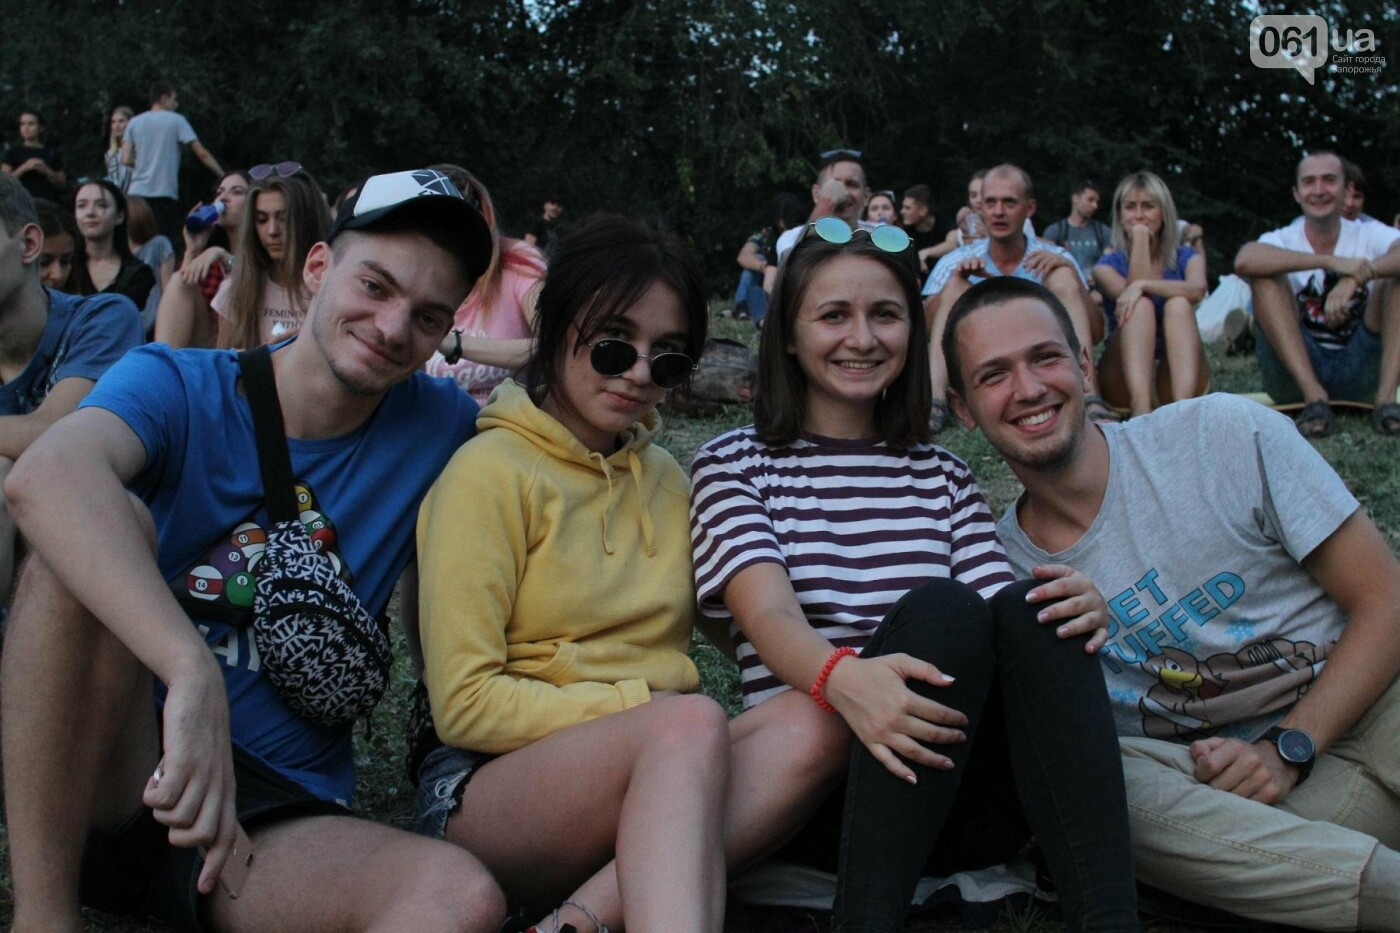 Найди себя: 50 портретов посетителей фестиваля Khortytsia Freedom, – ФОТОРЕПОРТАЖ, фото-48